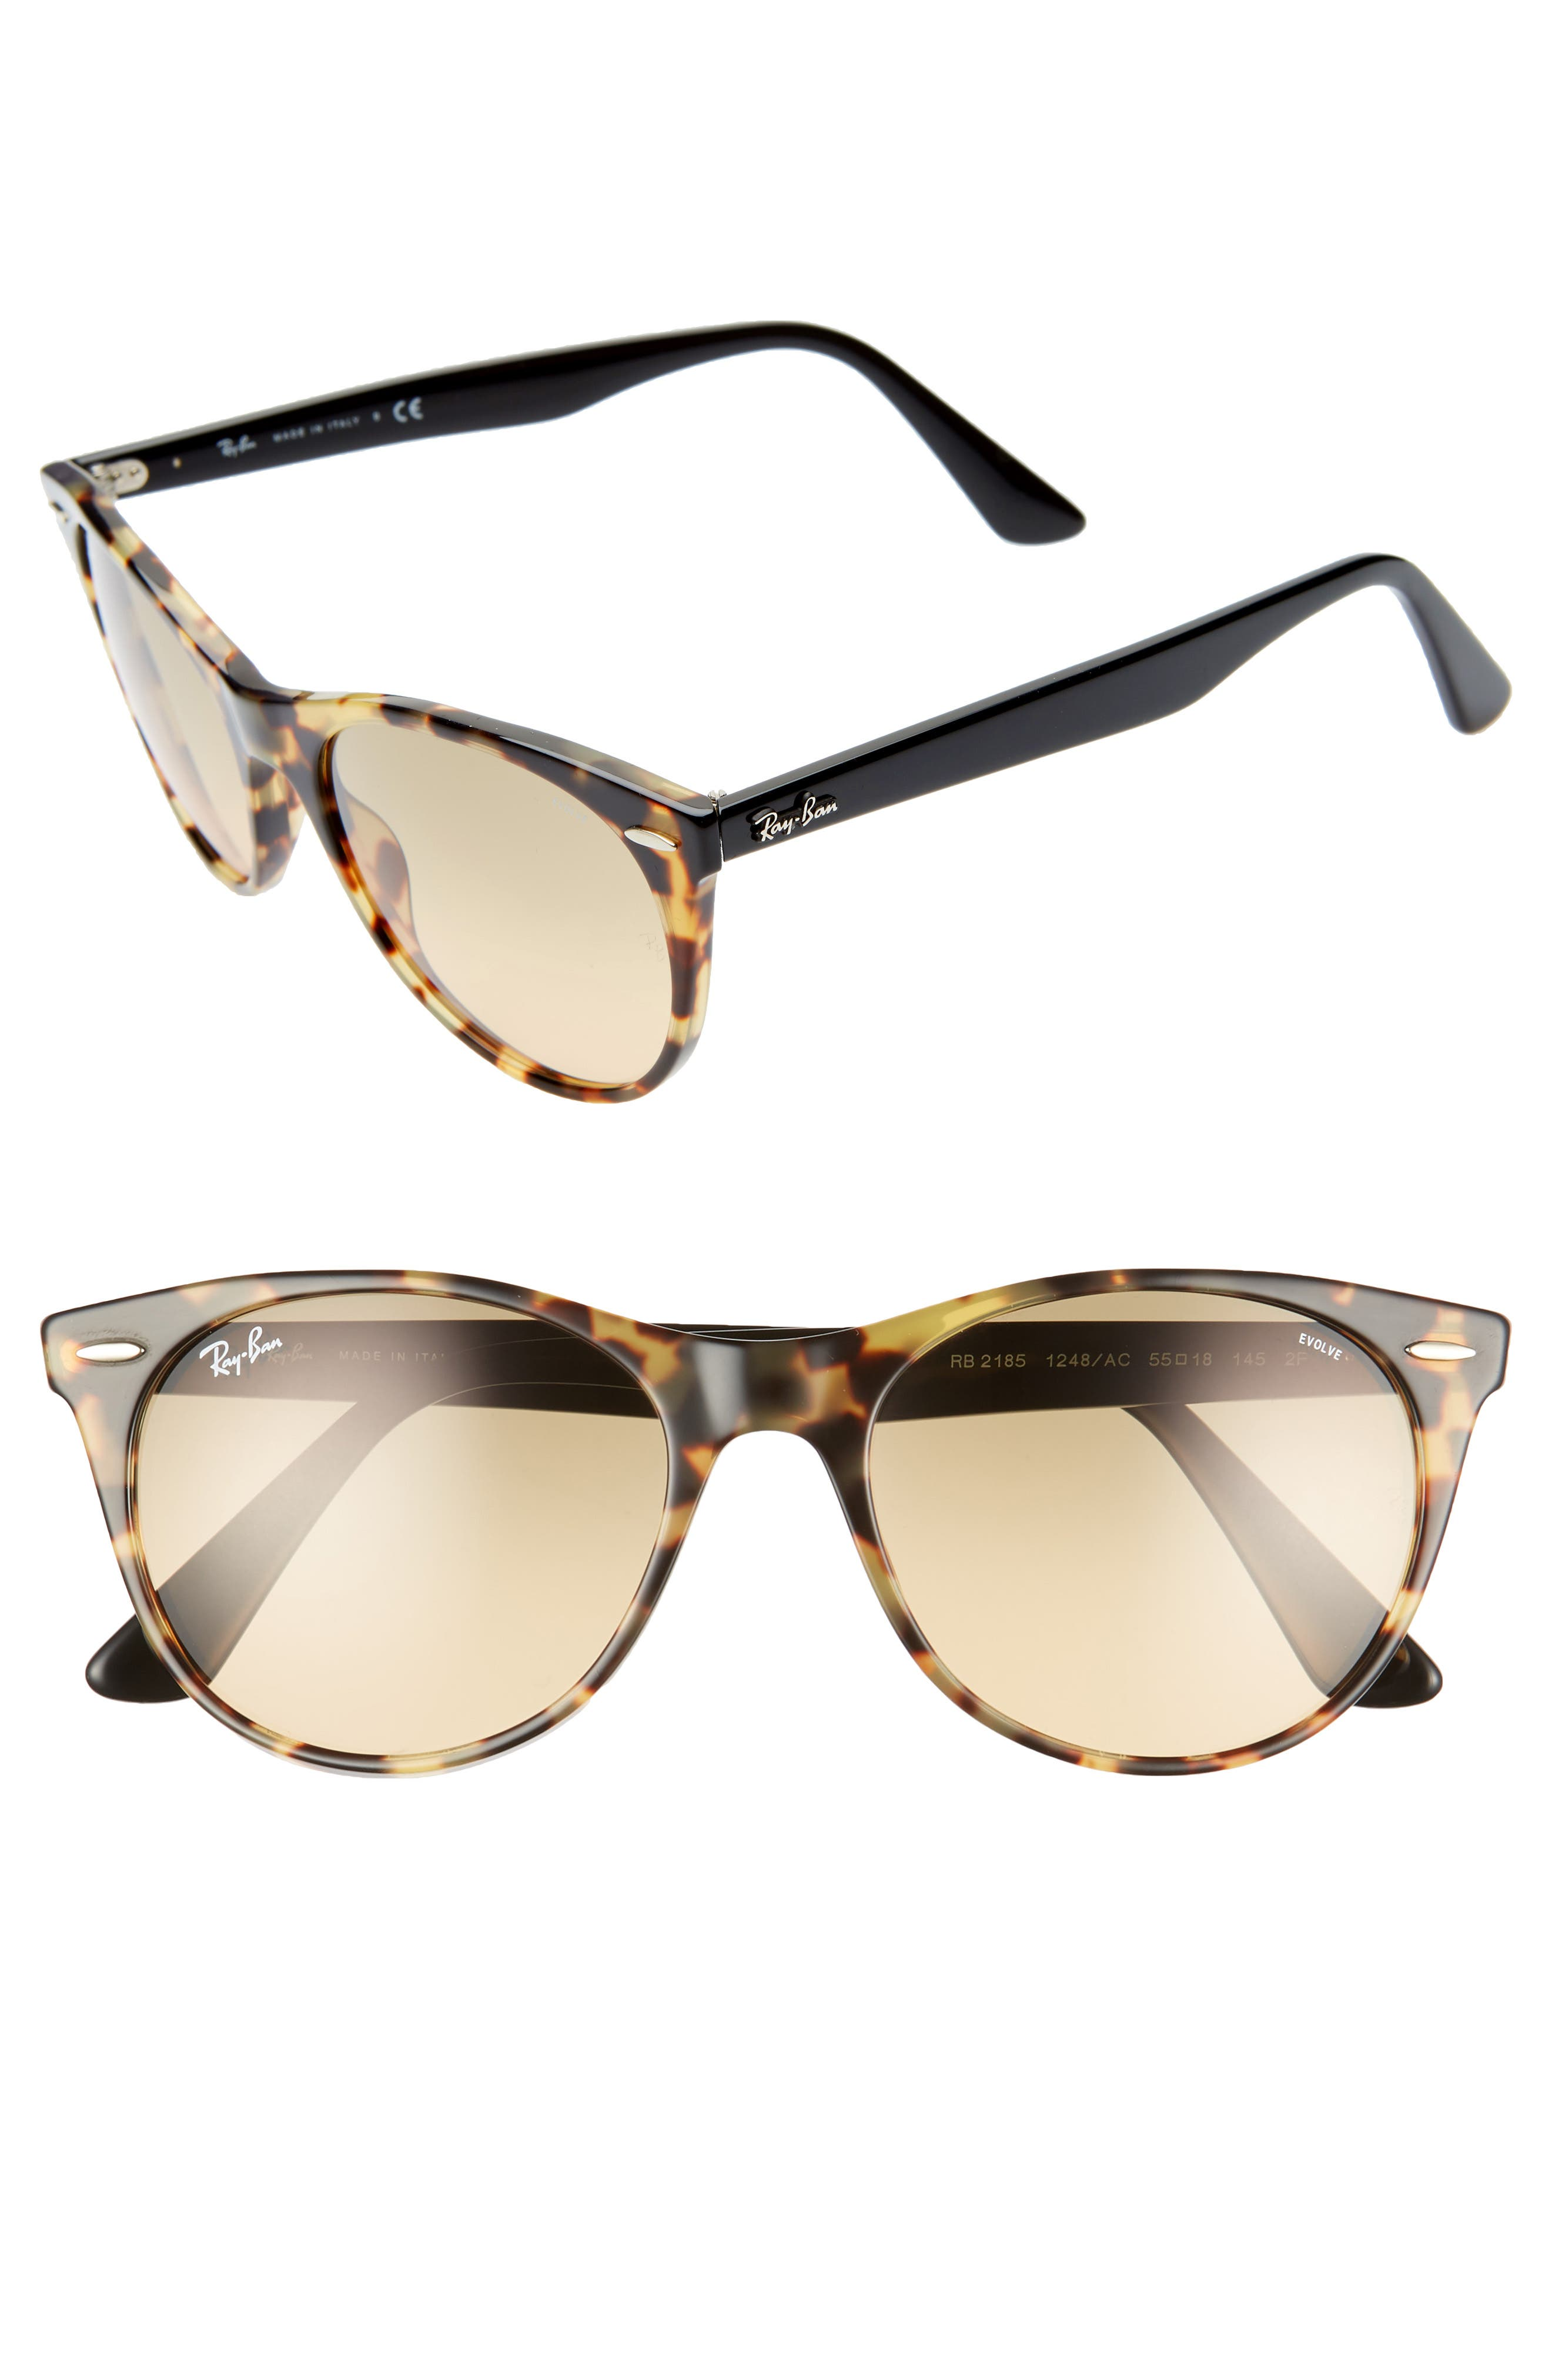 RAY-BAN Wayfarer II 55mm Polarized Photochromic Sunglasses, Main, color, 200